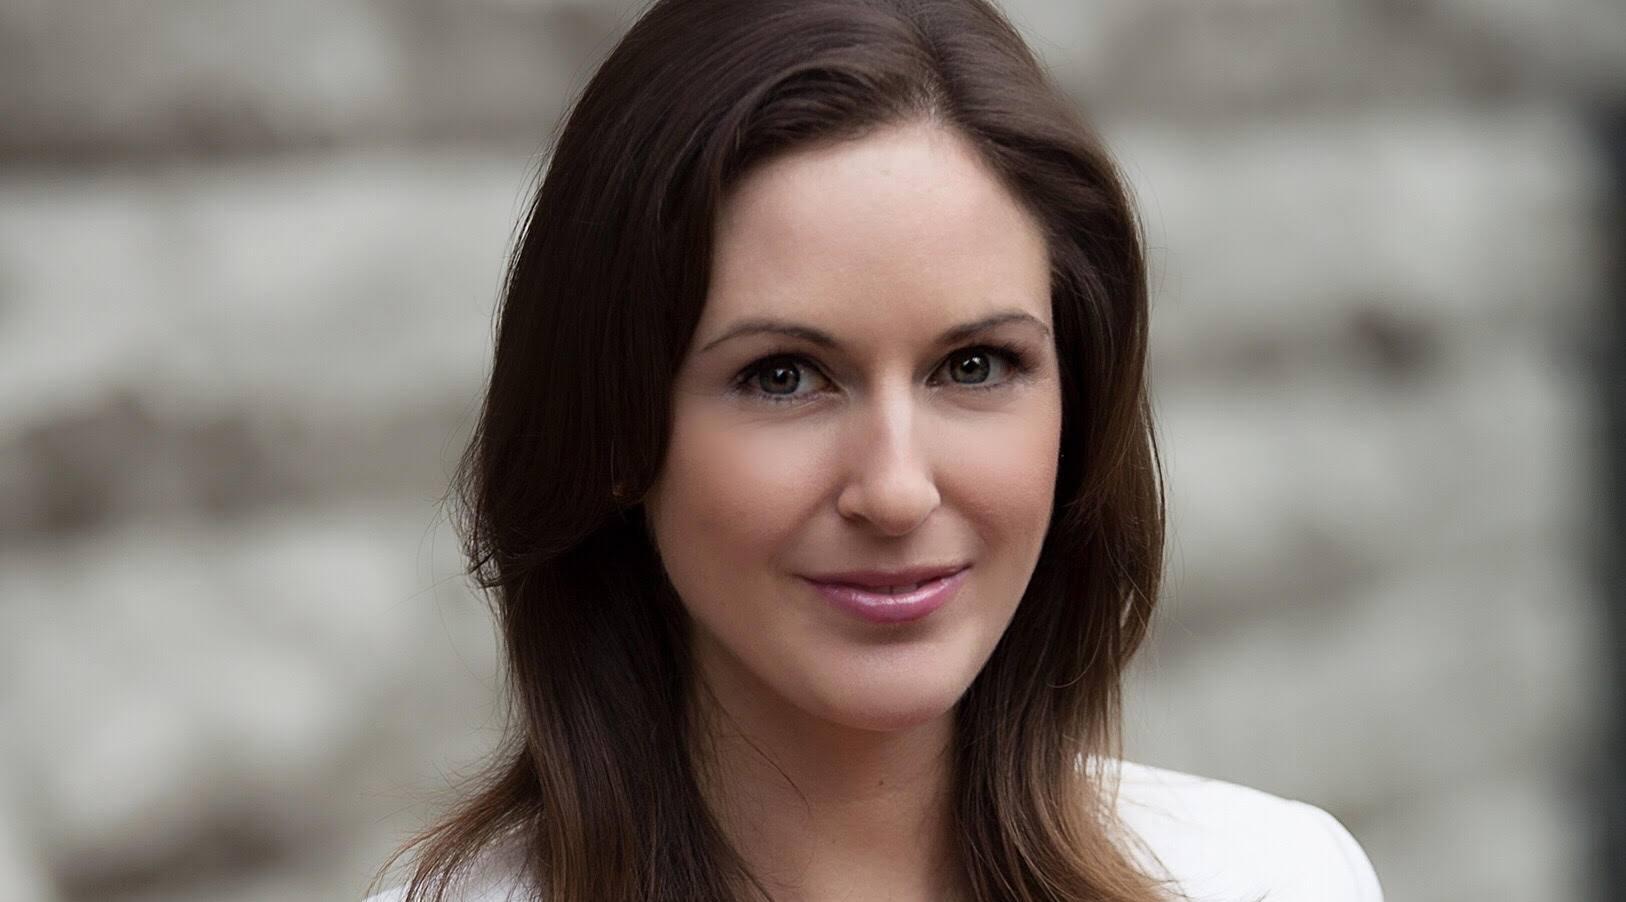 31-year-old Vancouver resident Jenna Bind (Jenna Bind / Brian Ceci)